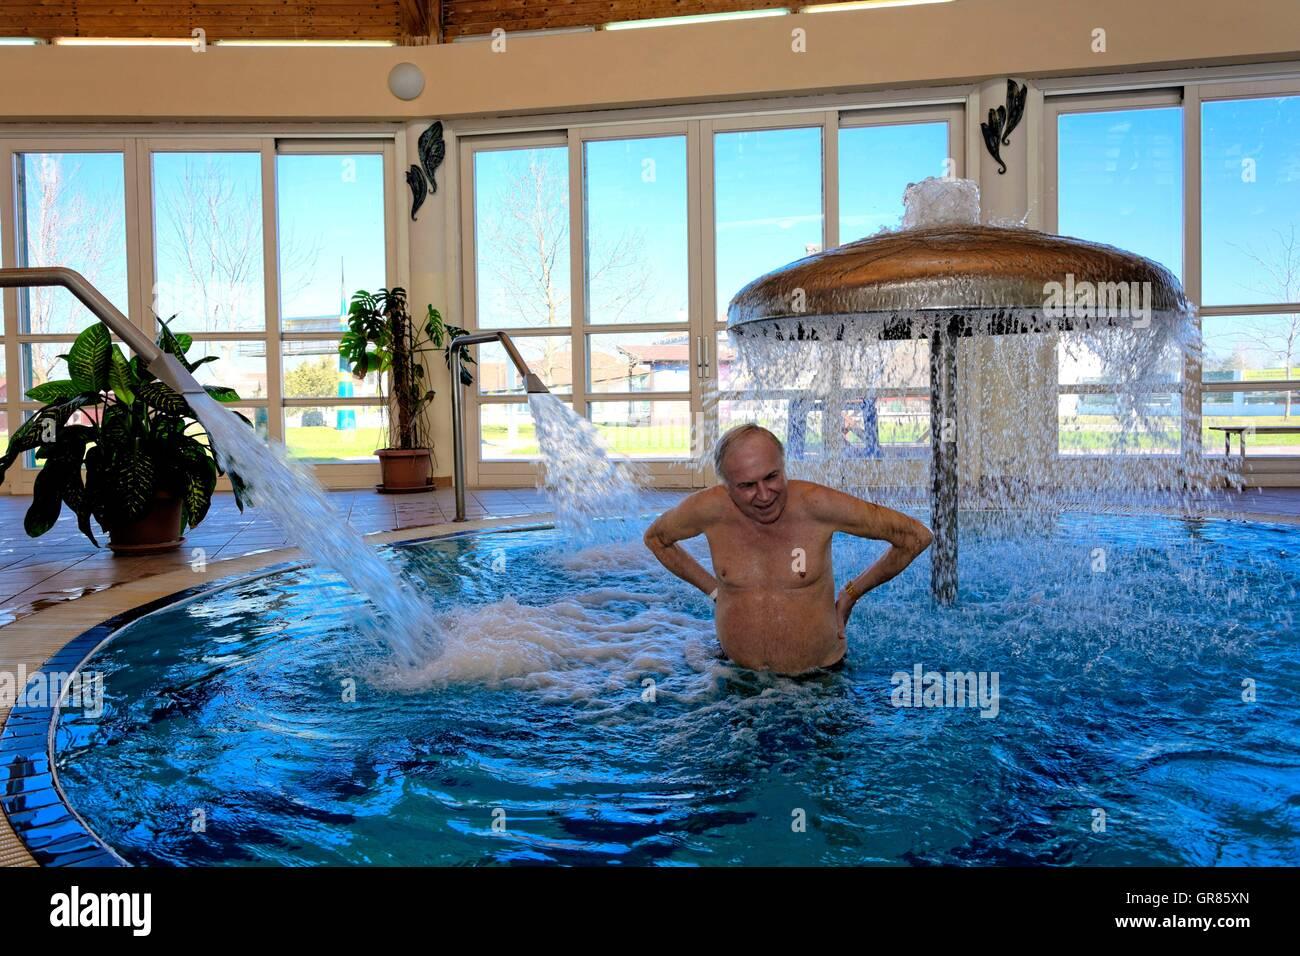 Bathing In Thermal Water Stock Photos & Bathing In Thermal Water ...